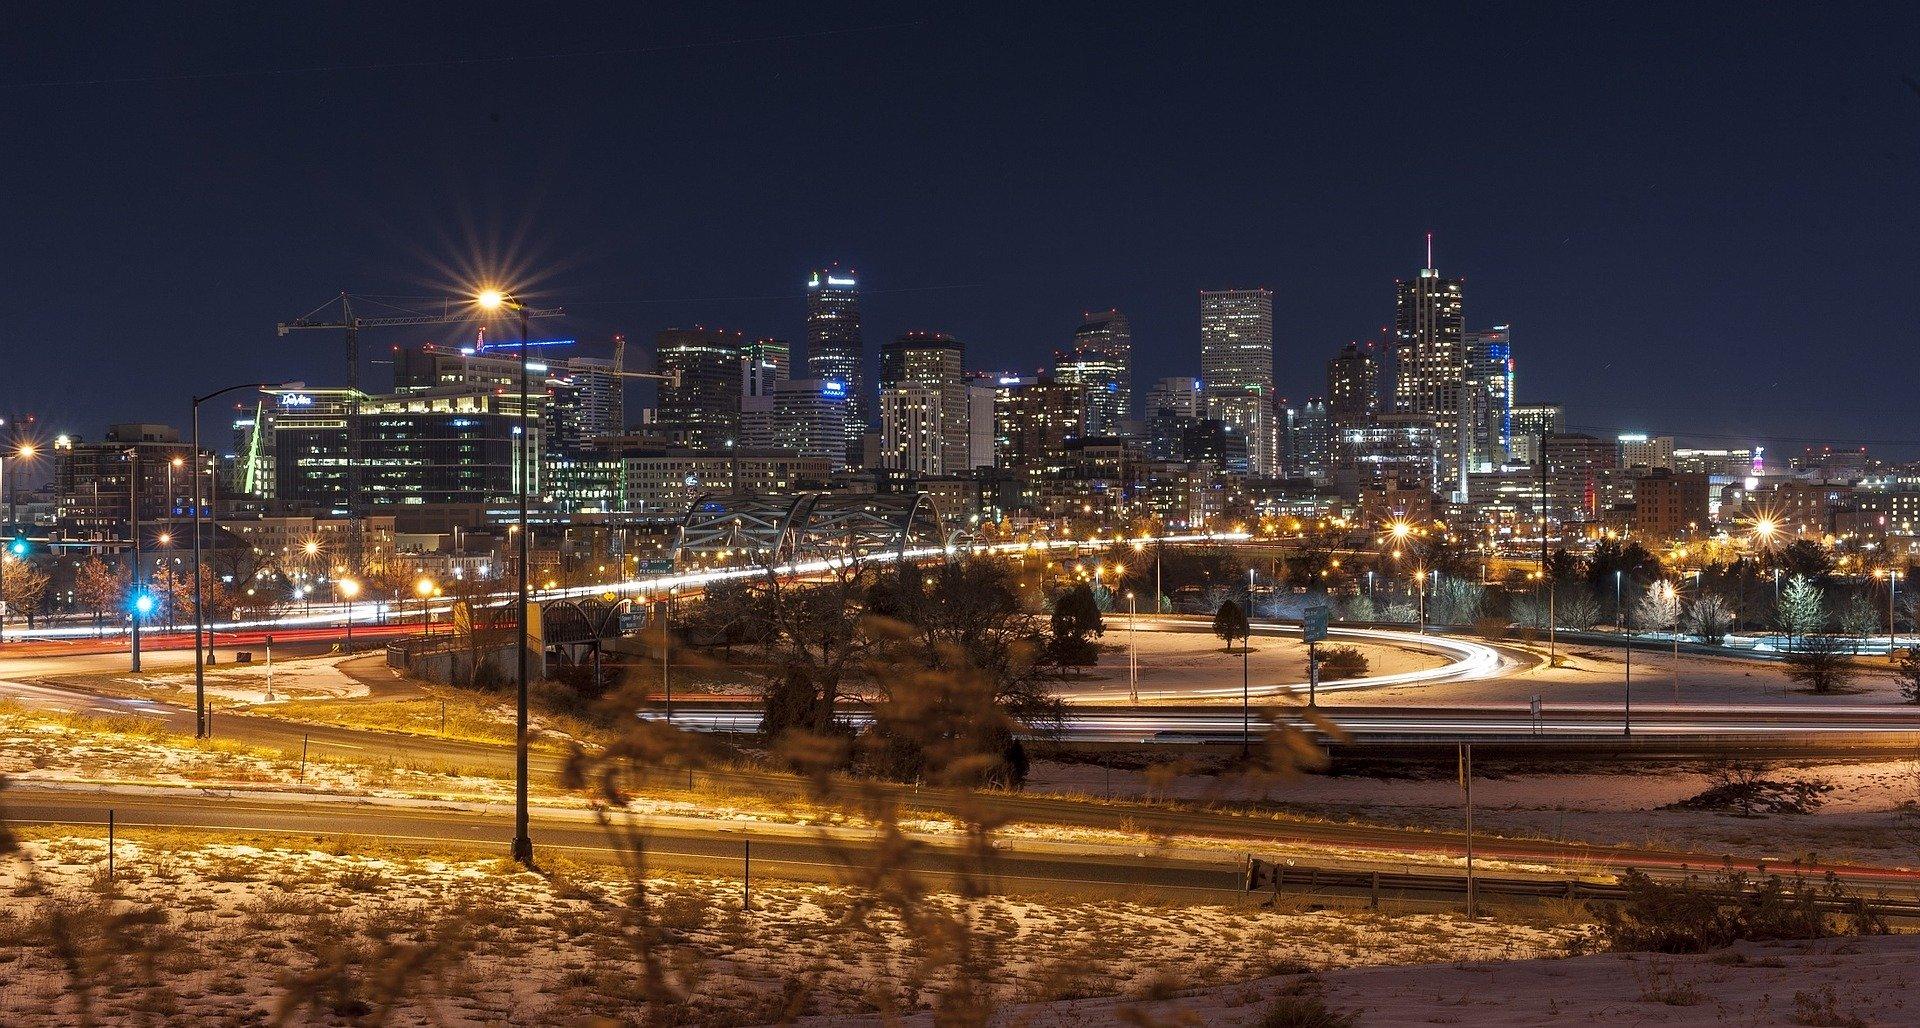 Denver Nightlife – Fun Things to Do in Denver at Night